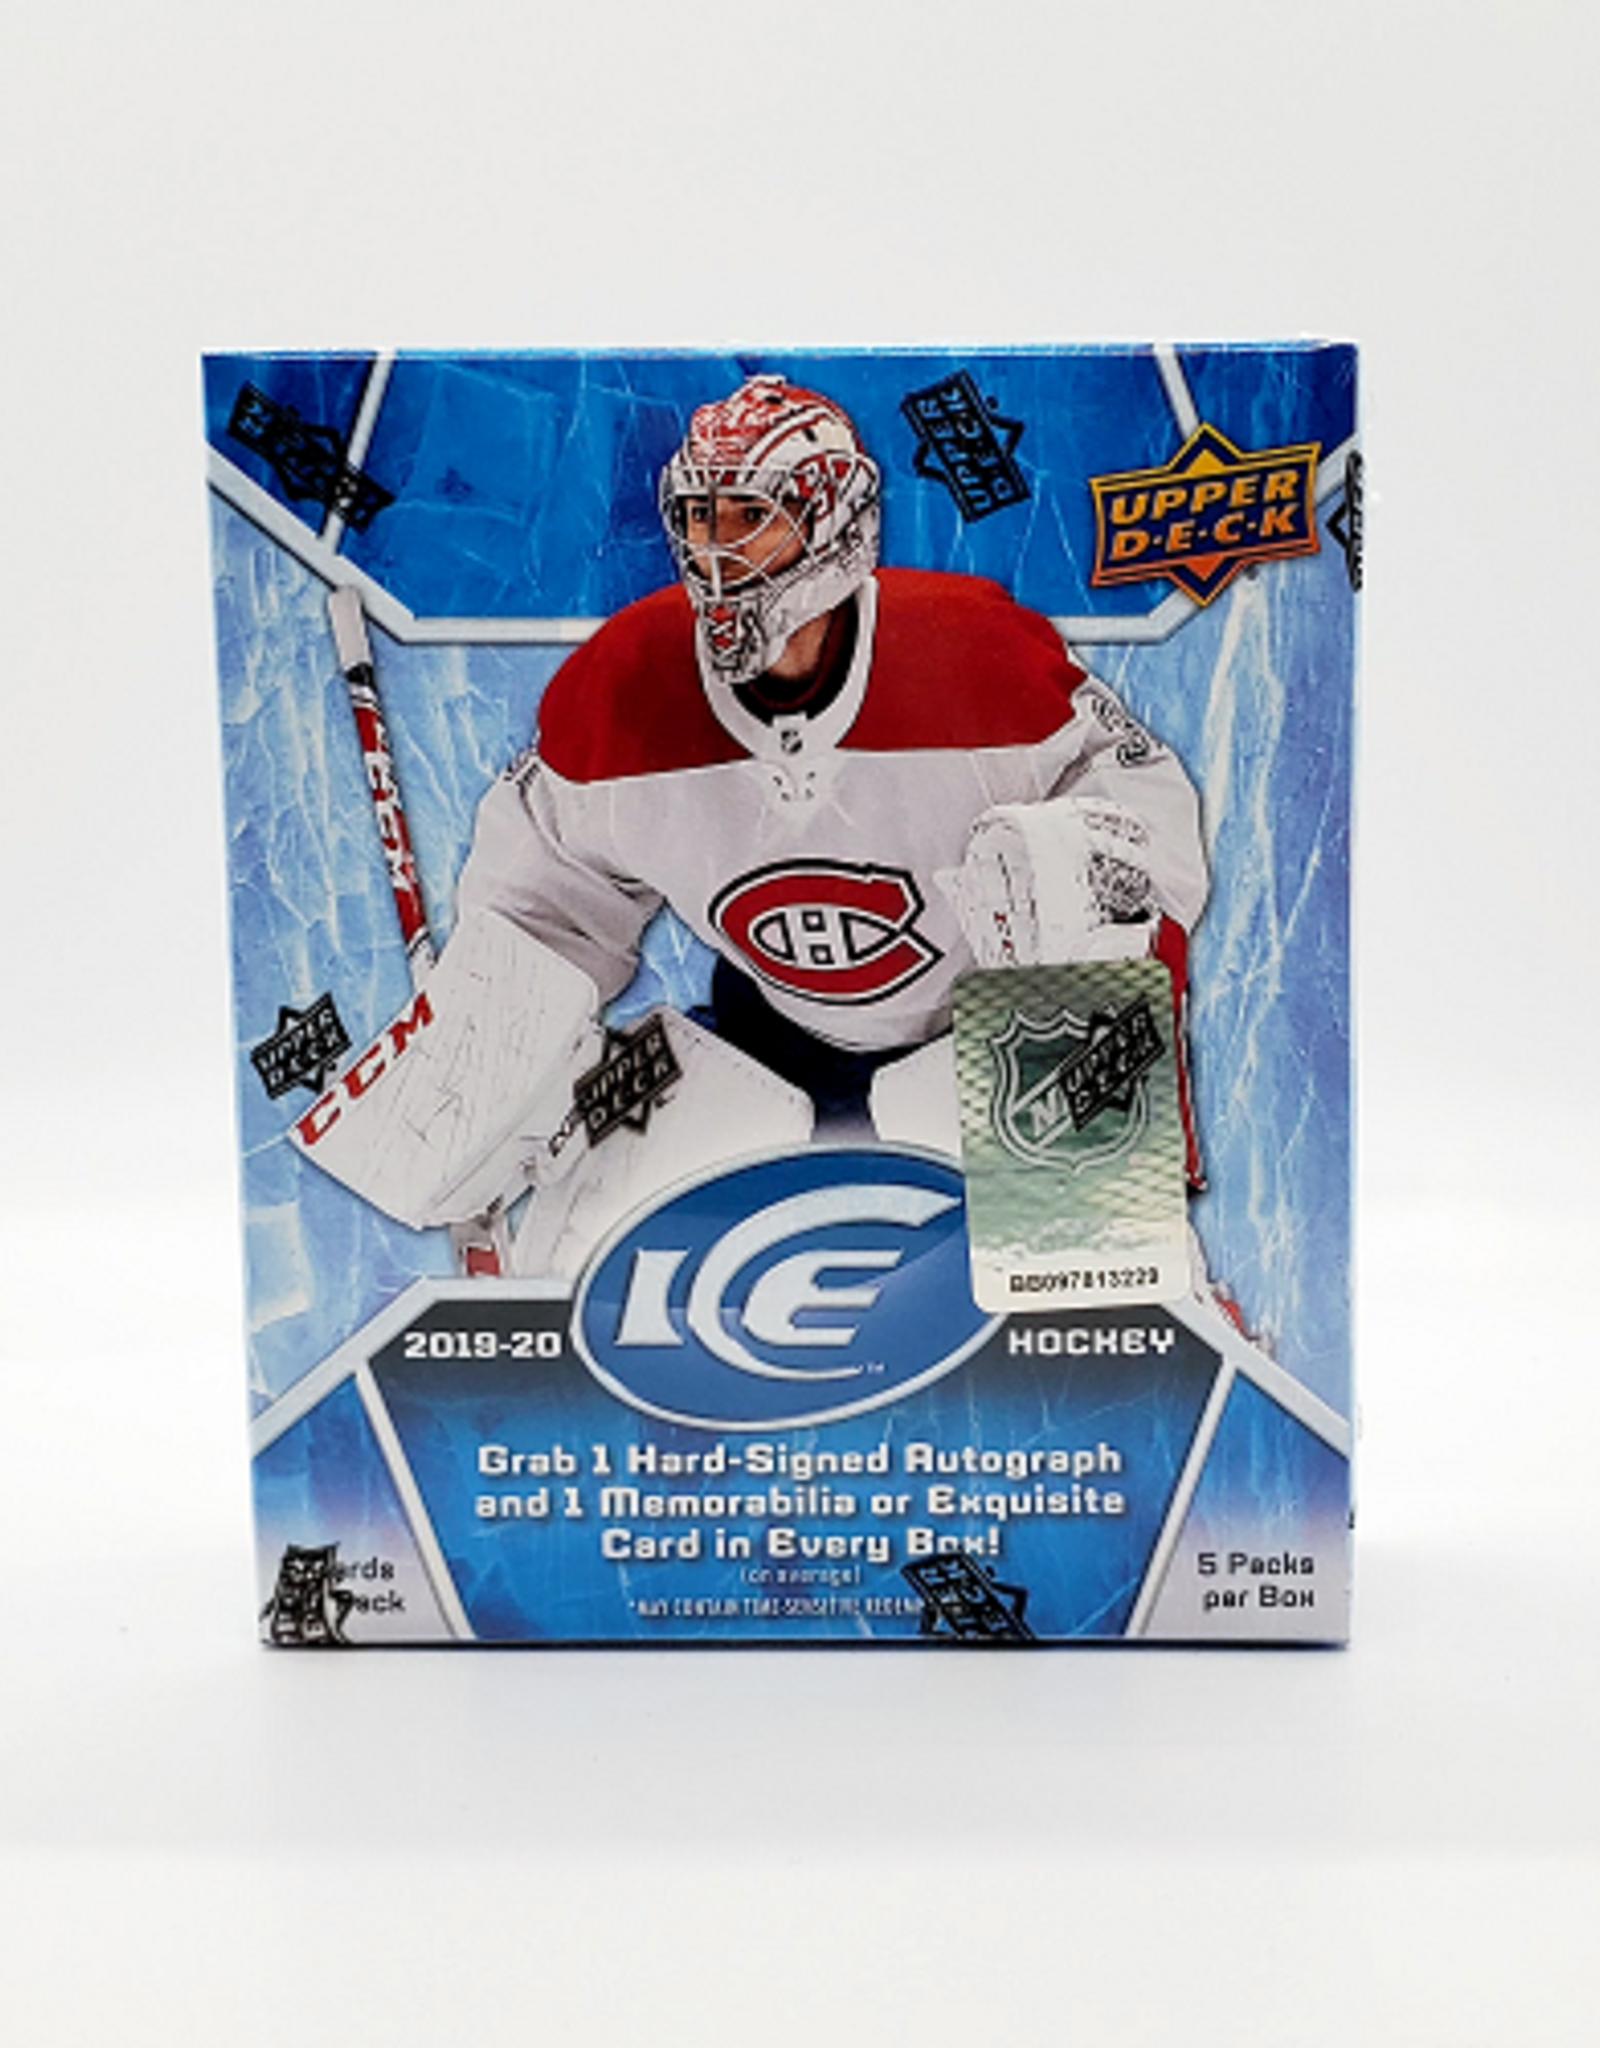 Upper Deck 2019-20 Upper Deck Ice Hockey Hobby Box